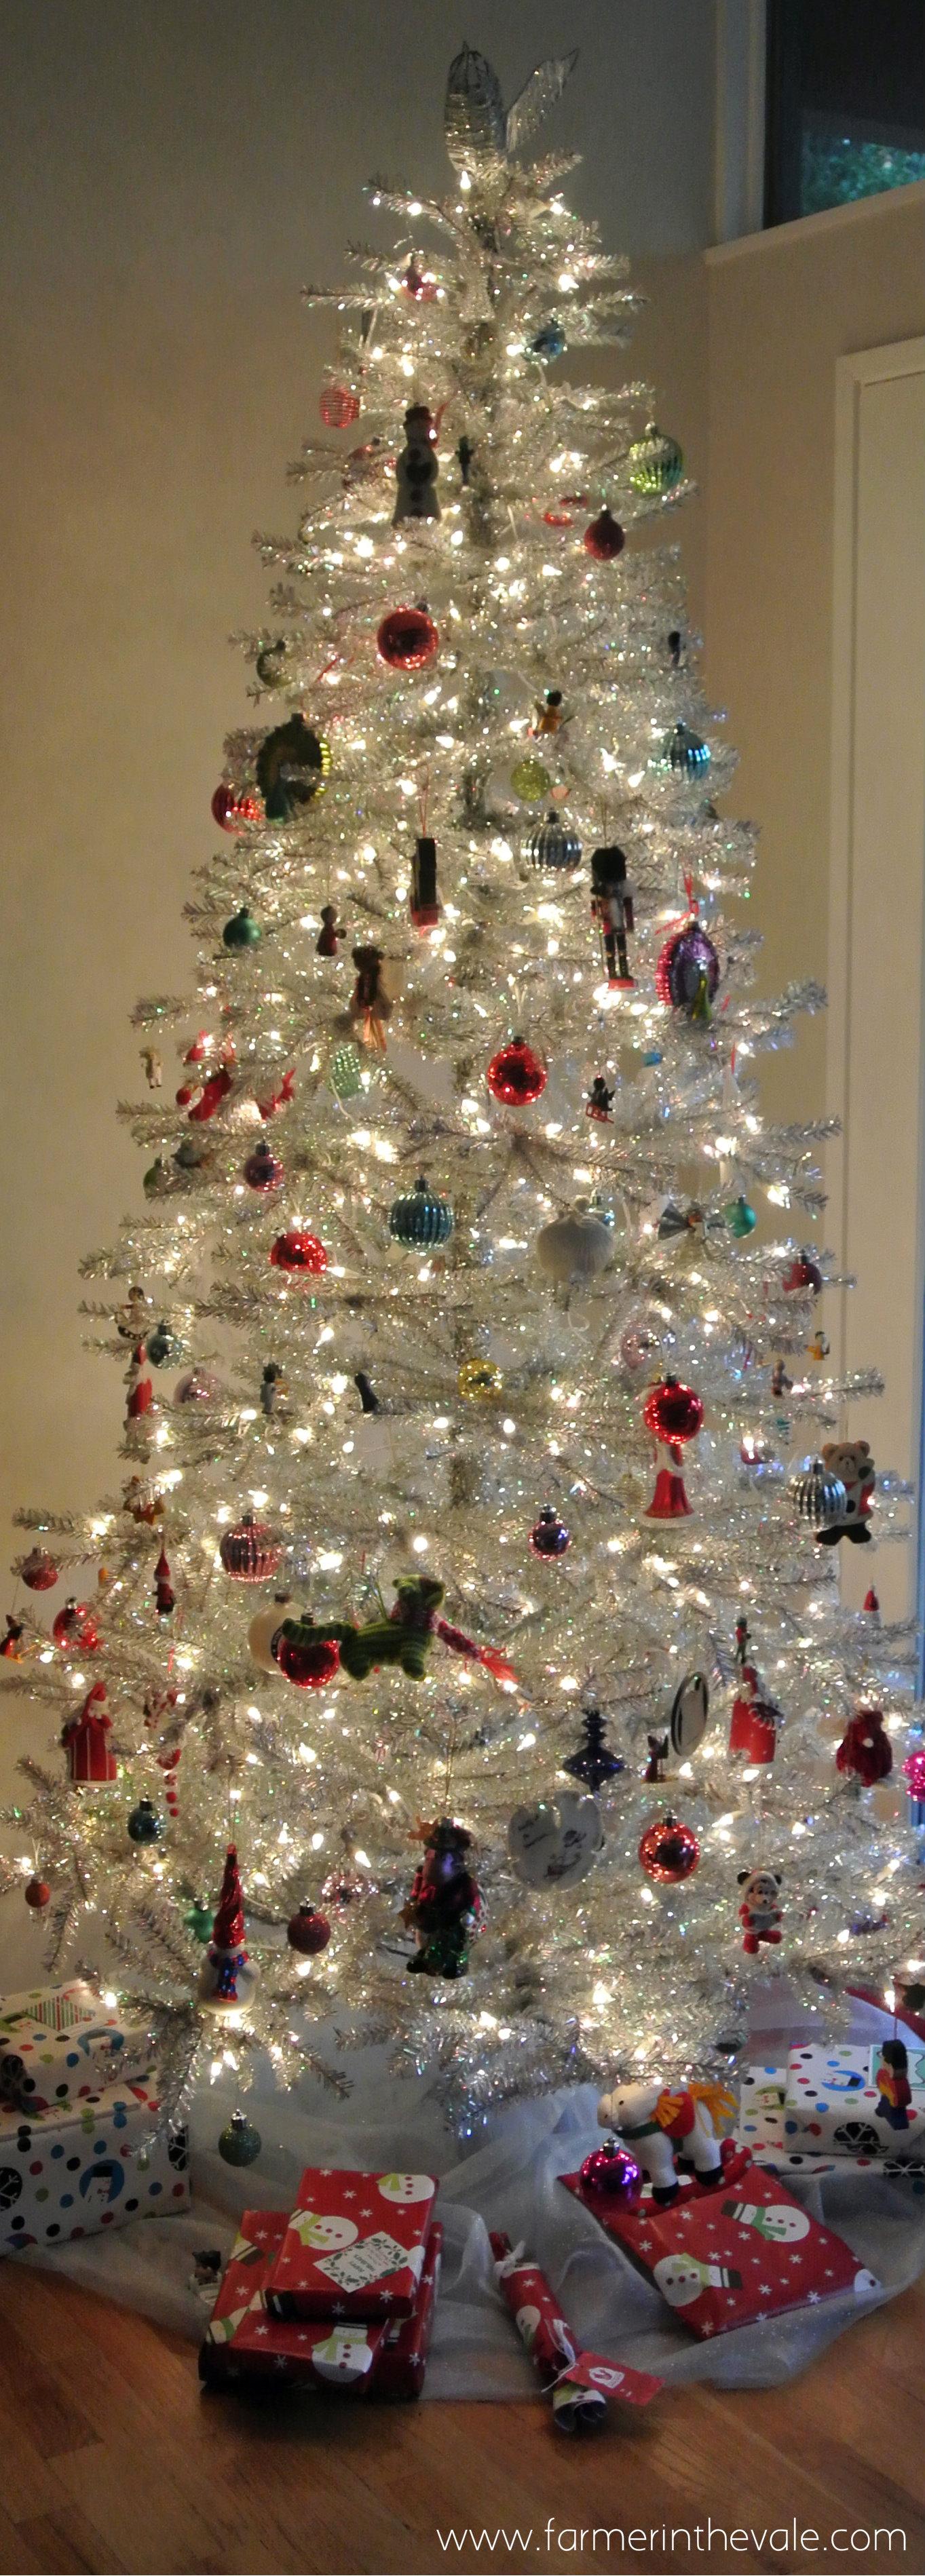 An Eichler Christmas Our Silver